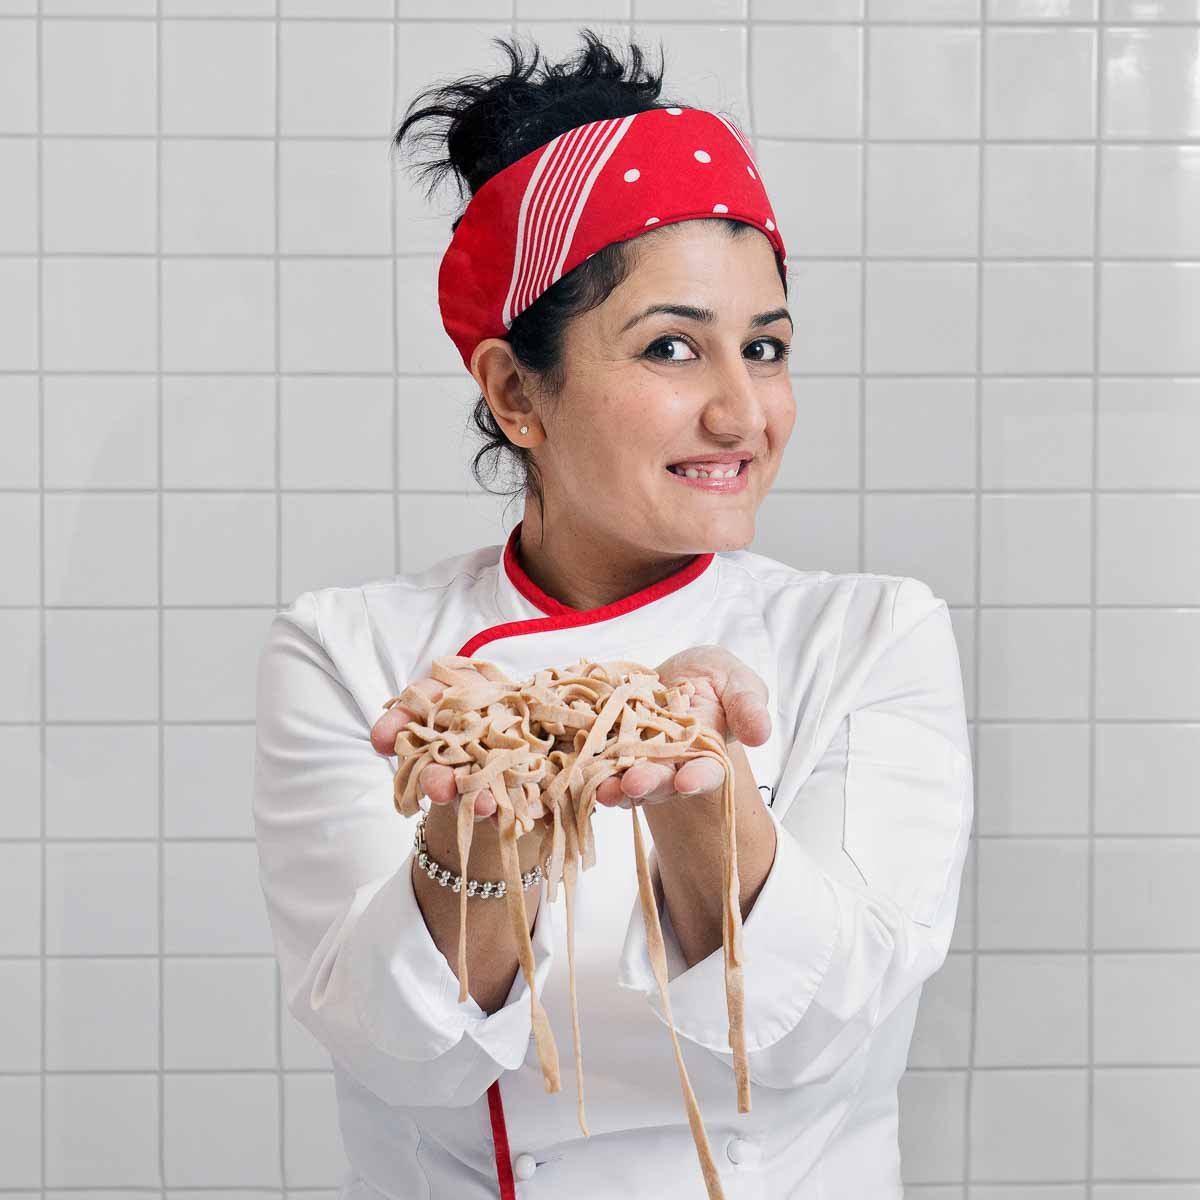 Luisa Kocht Feinkost aus Neapel in Prenzlauer Berg-6